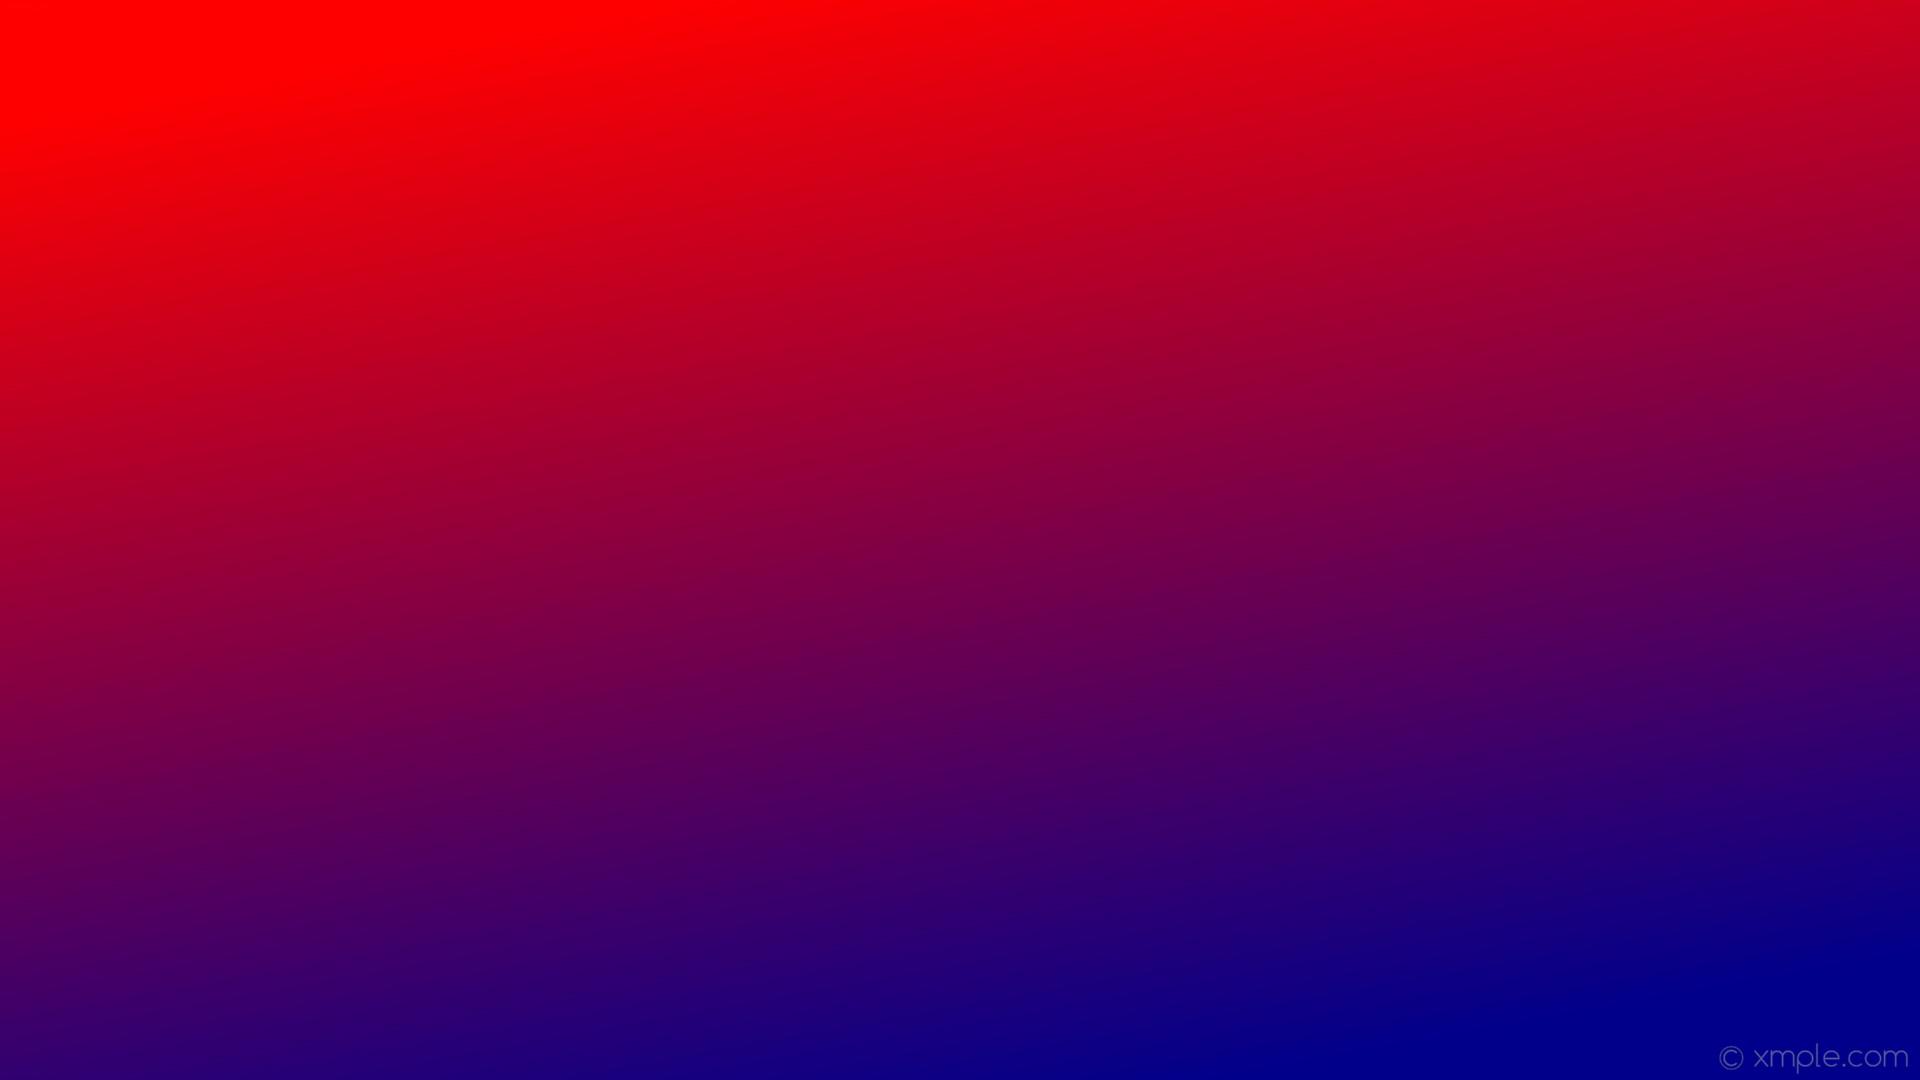 wallpaper gradient blue red linear dark blue #00008b #ff0000 300°